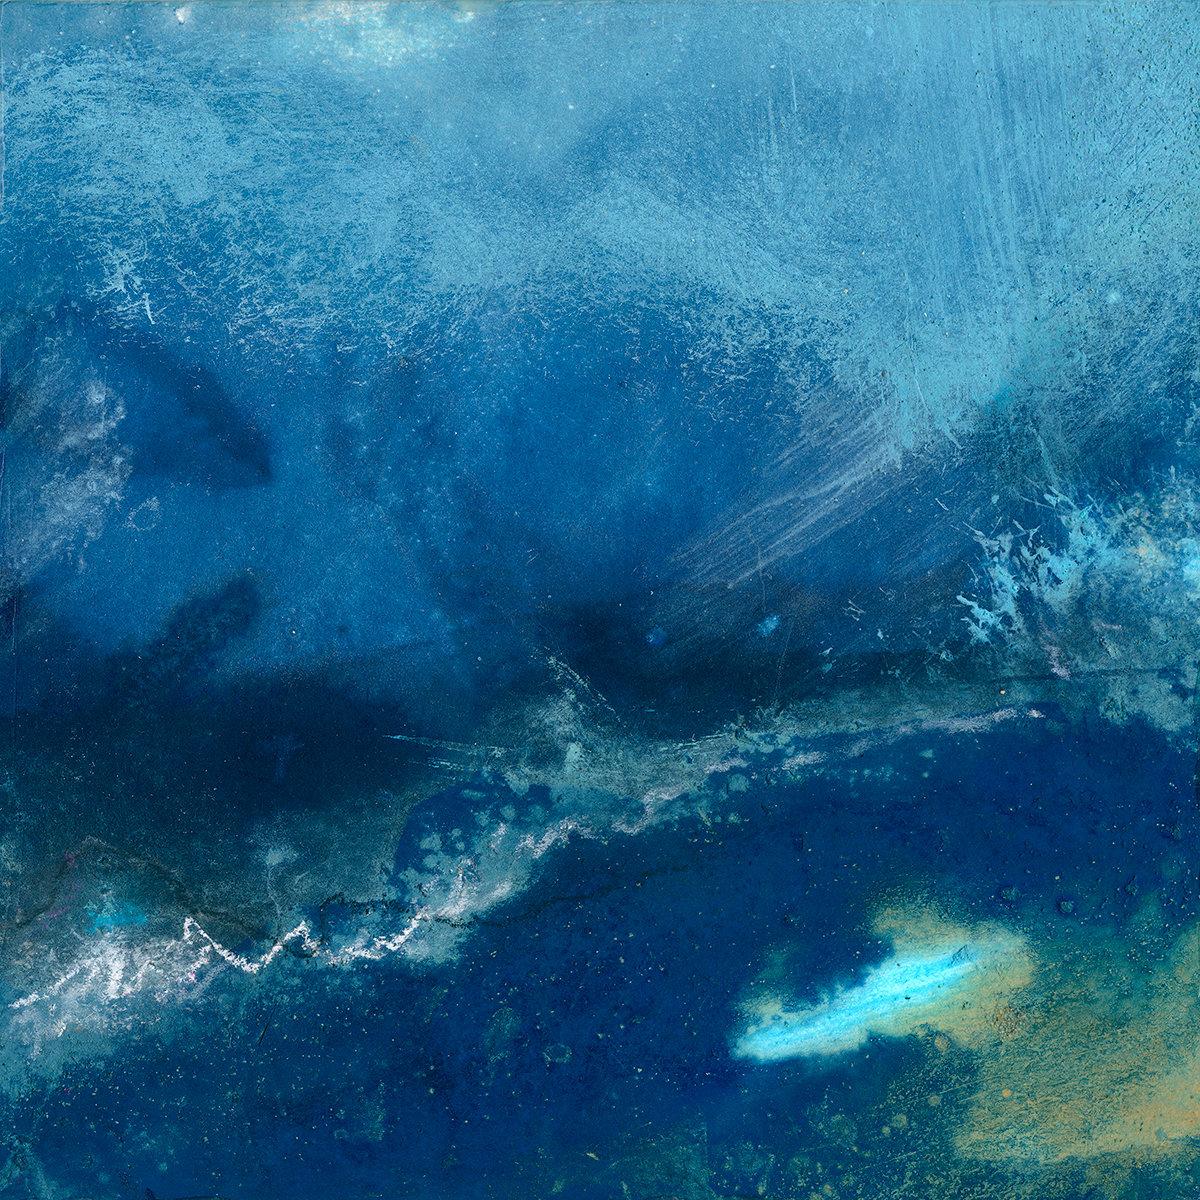 Marianthi Lainas, Sea Signature #3